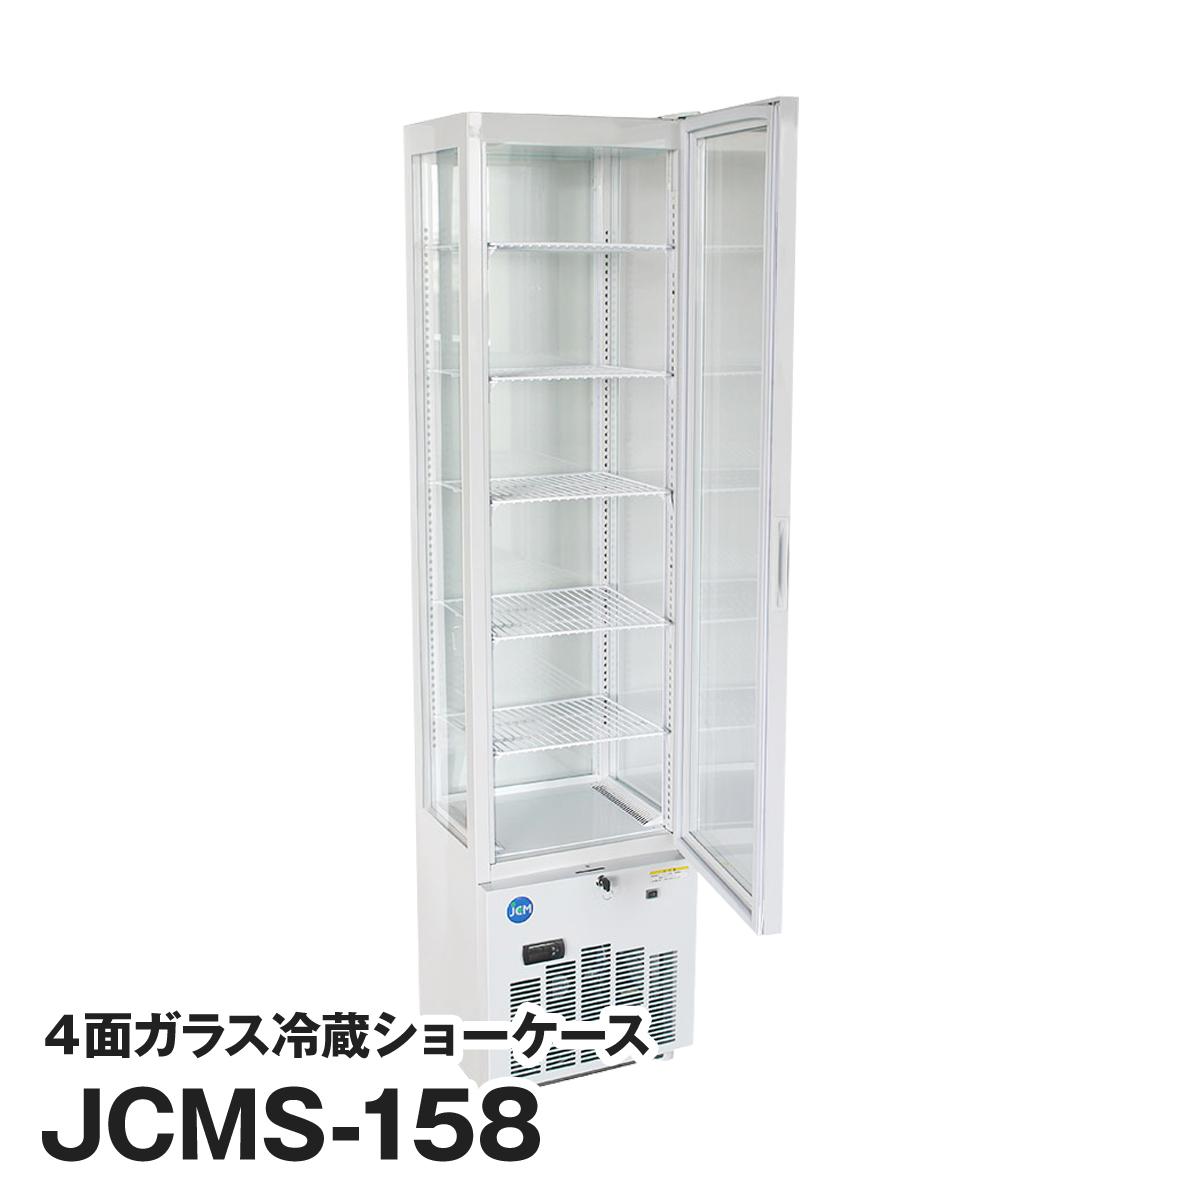 JCM社製 業務用 保冷庫 冷蔵庫 158L 4面 ガラス 冷蔵 ショーケース JCMS-158 新品